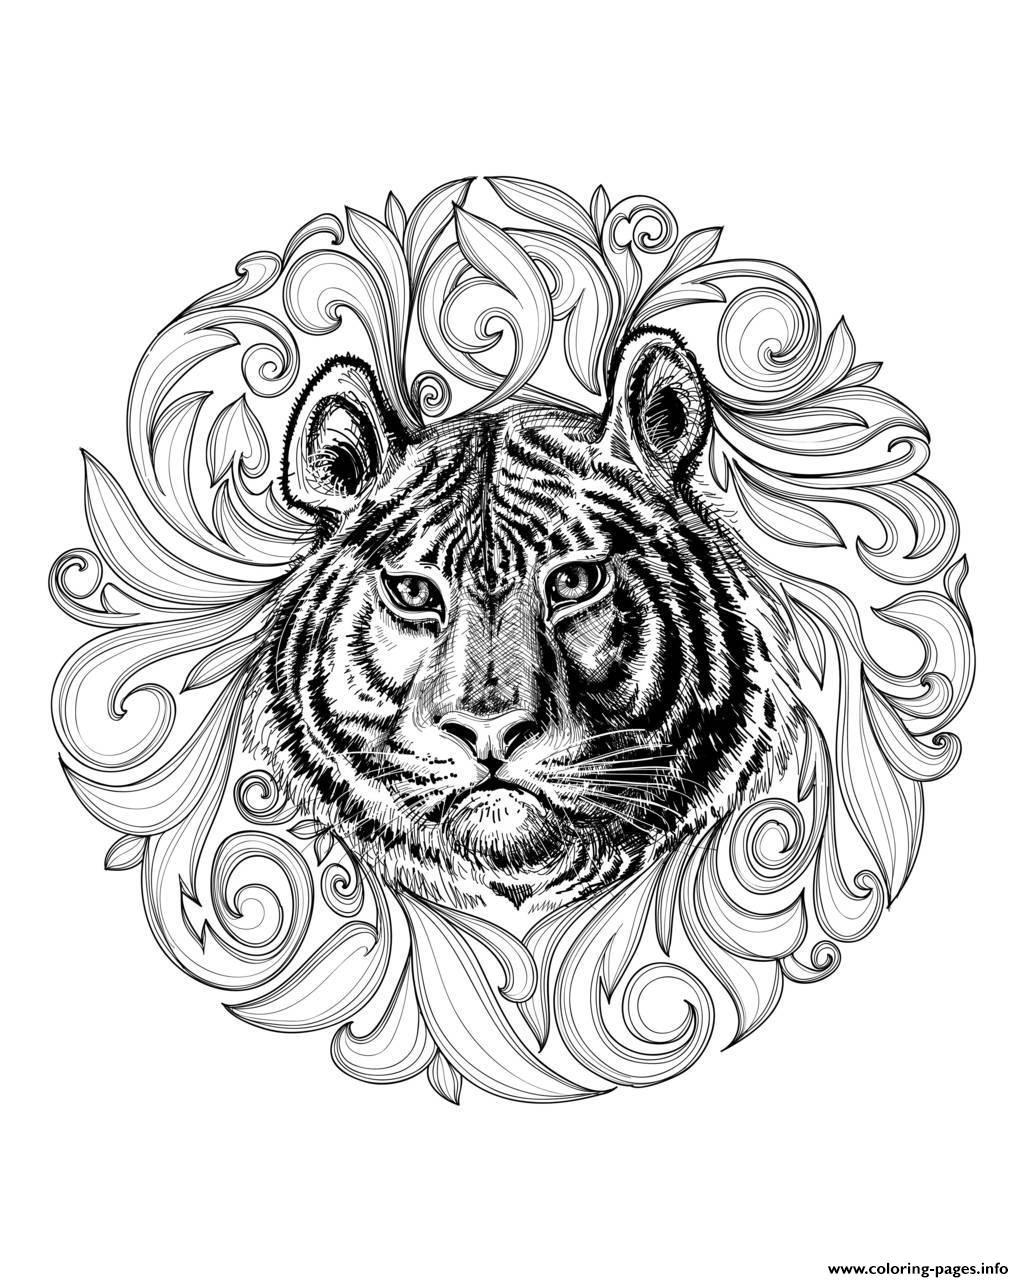 Adult africa tiger leaves framework coloring pages free printable